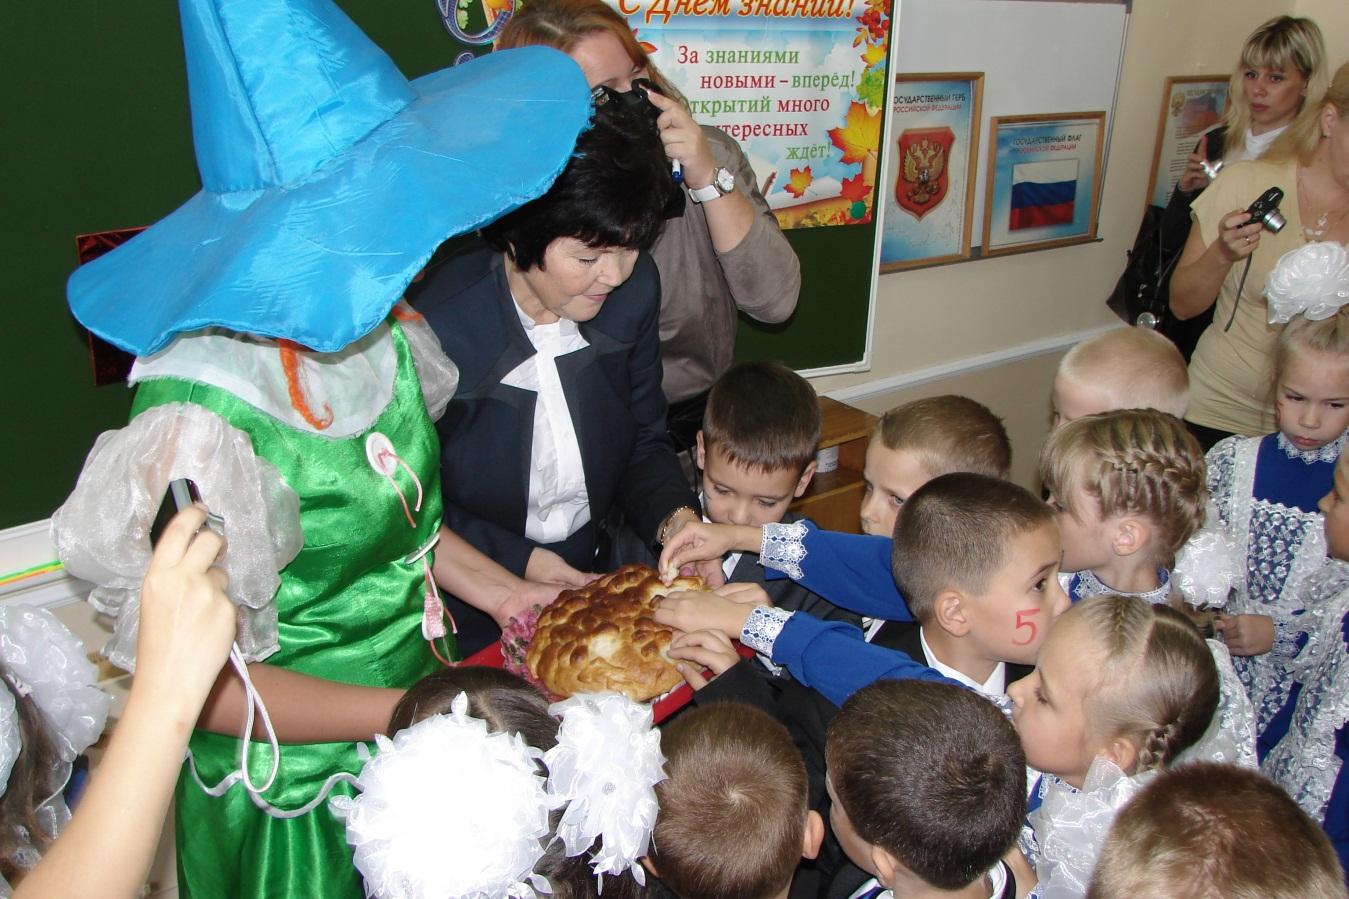 C:\Users\toshiba\Pictures\посвящение в Занковцы !\школа\DSC08071.JPG